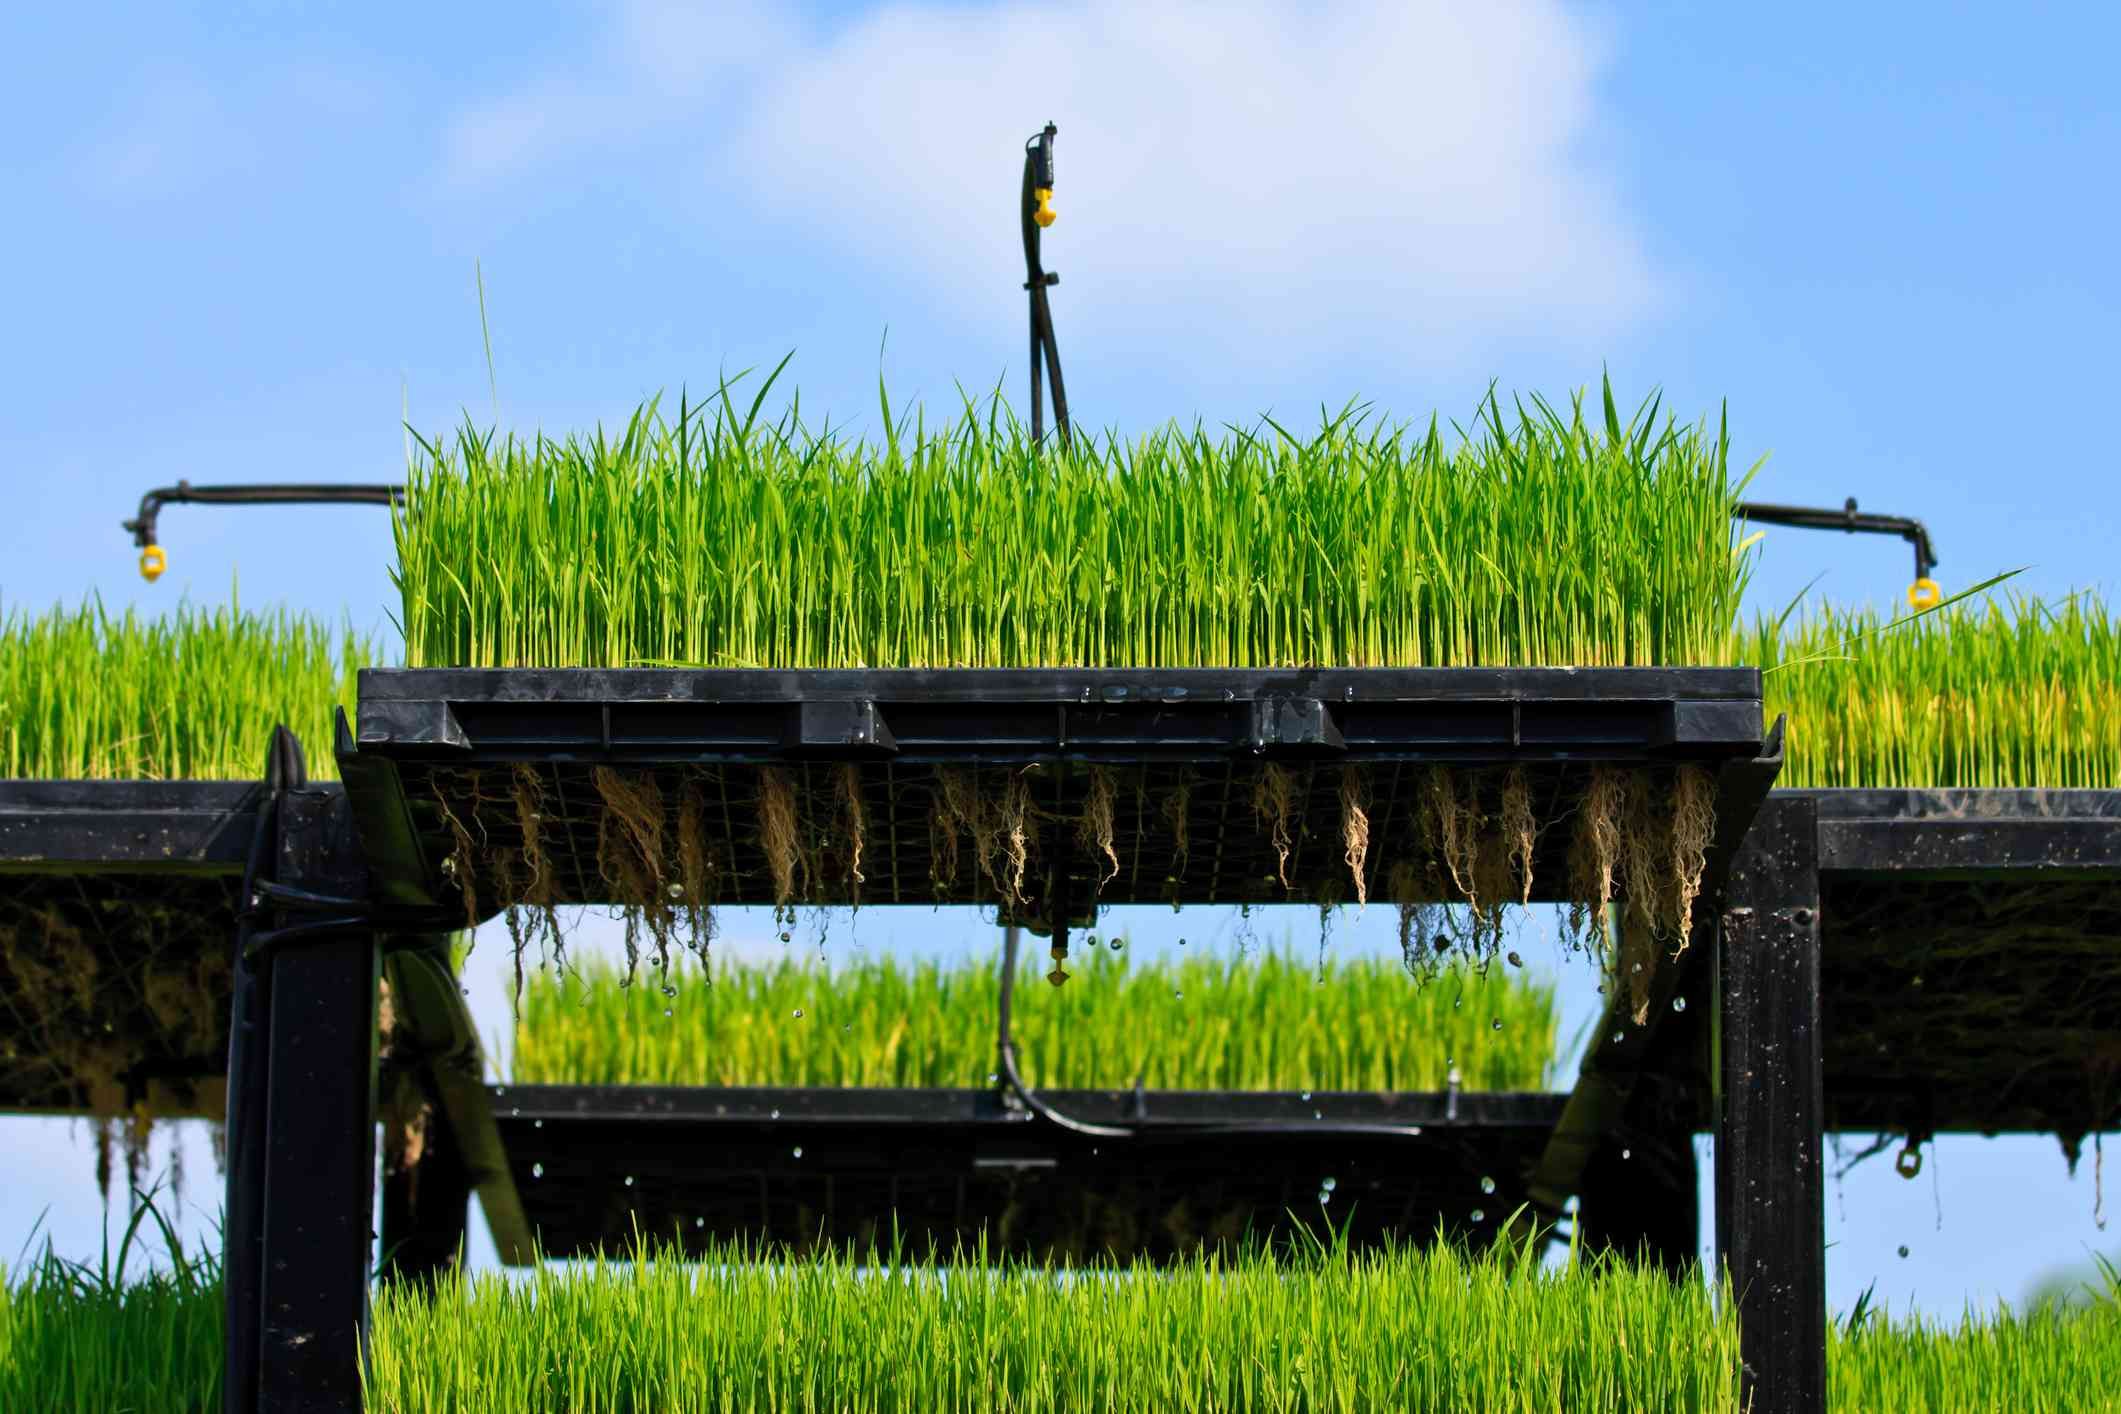 Stacks of aeroponics rice plants